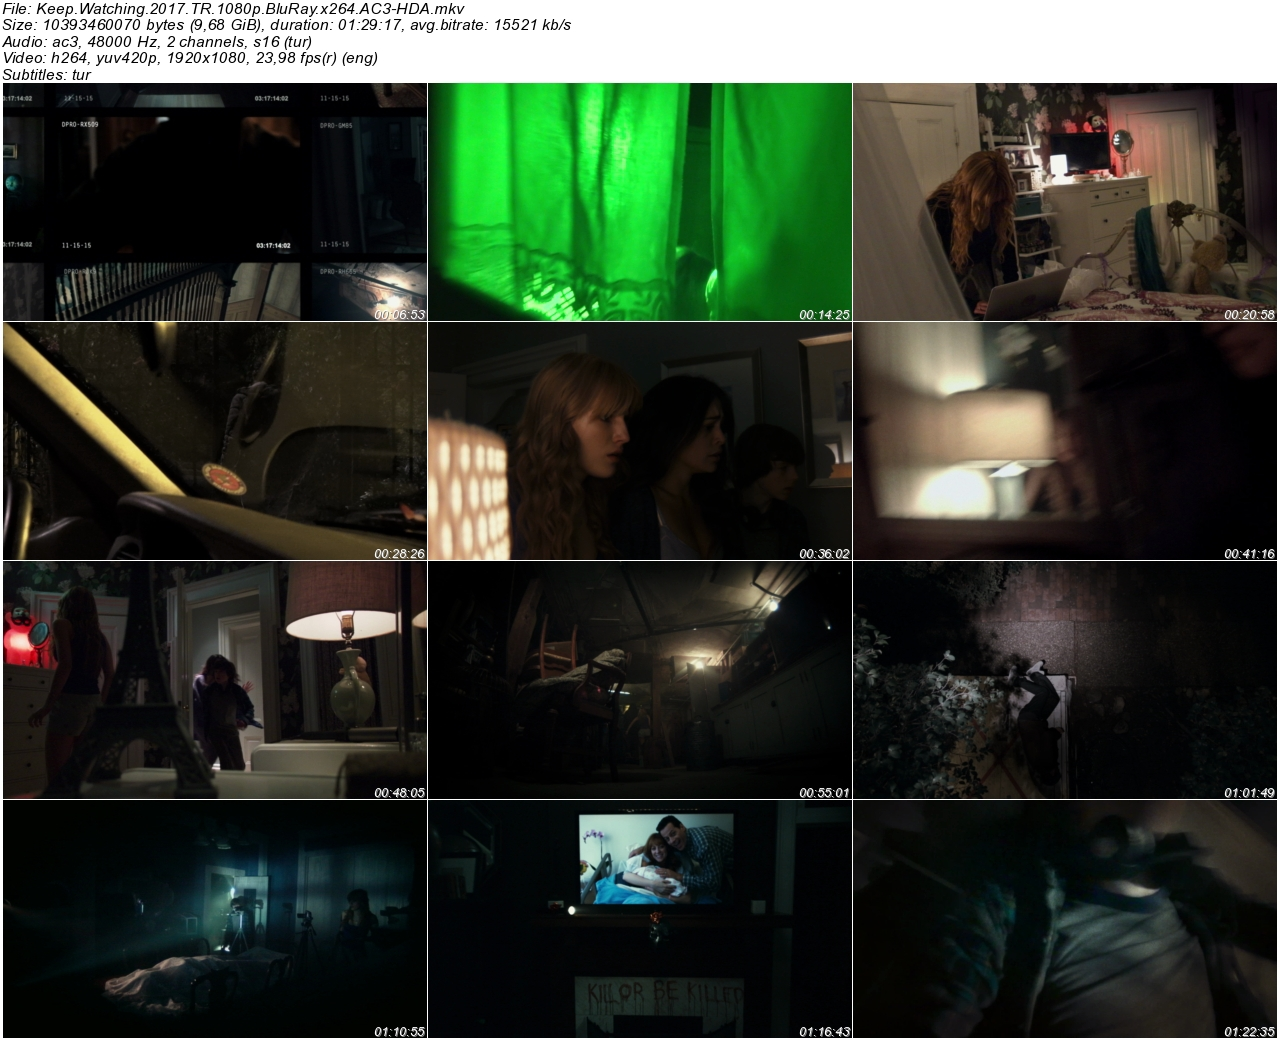 Keep Watching 2017 - 1080p 720p 480p - Türkçe Dublaj Tek Link indir